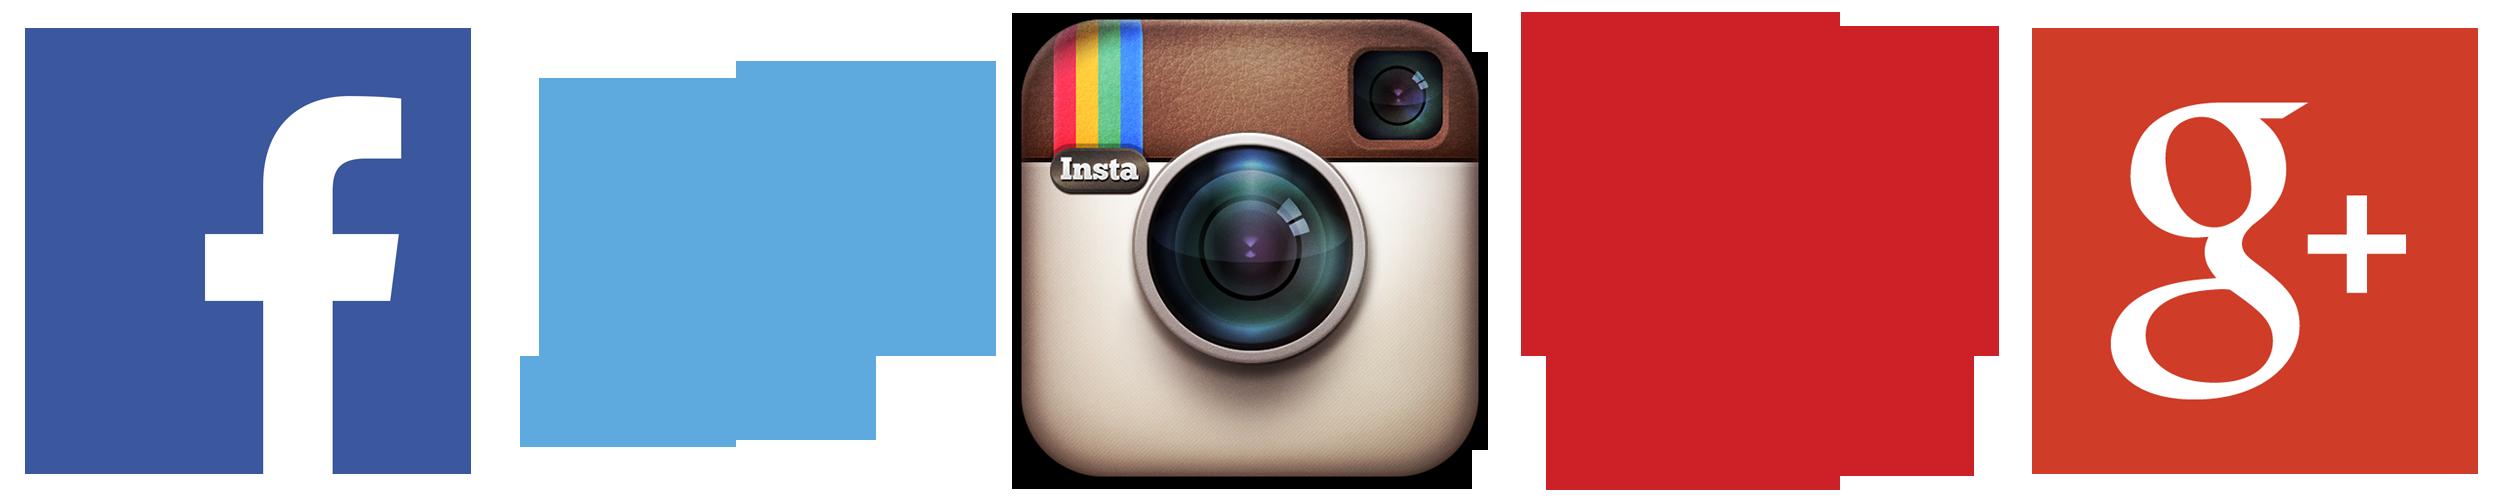 social-media-instagram-facebook-twitter-youtube-icons